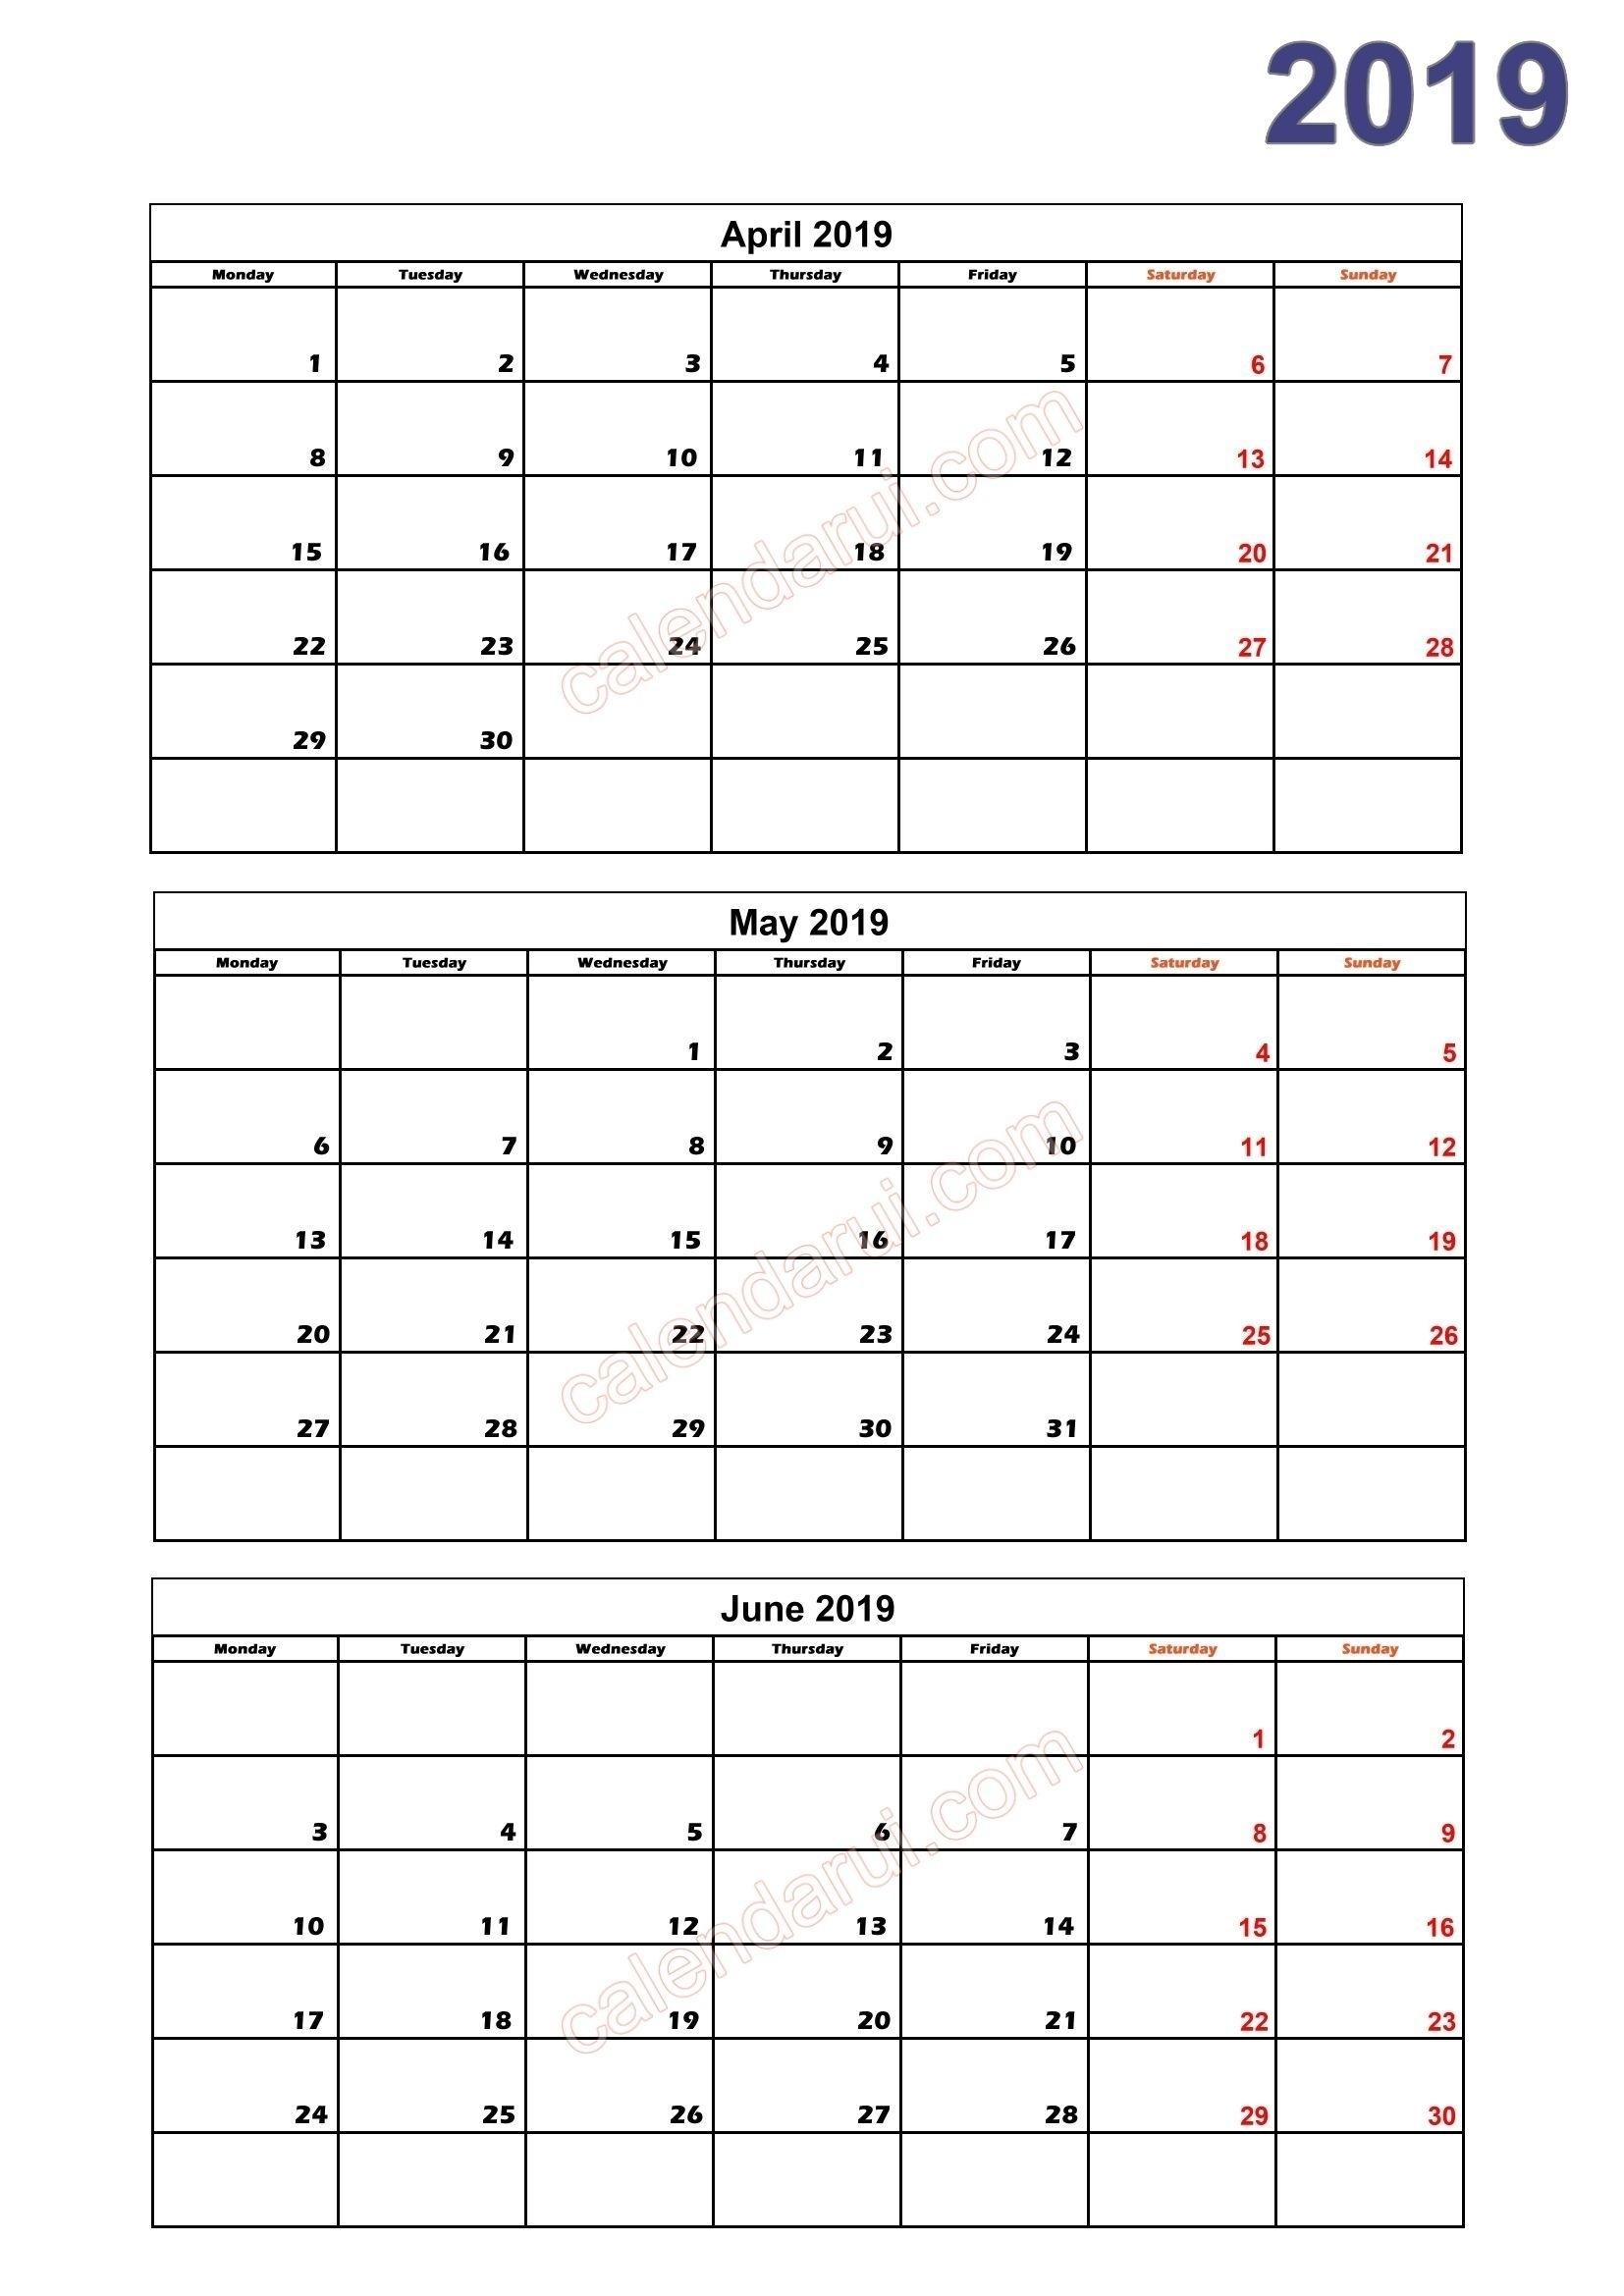 Free Printable Calendar Quarterly In 2020 | Calendar 2019 with regard to Calendar For Quarterly 2020 Printable